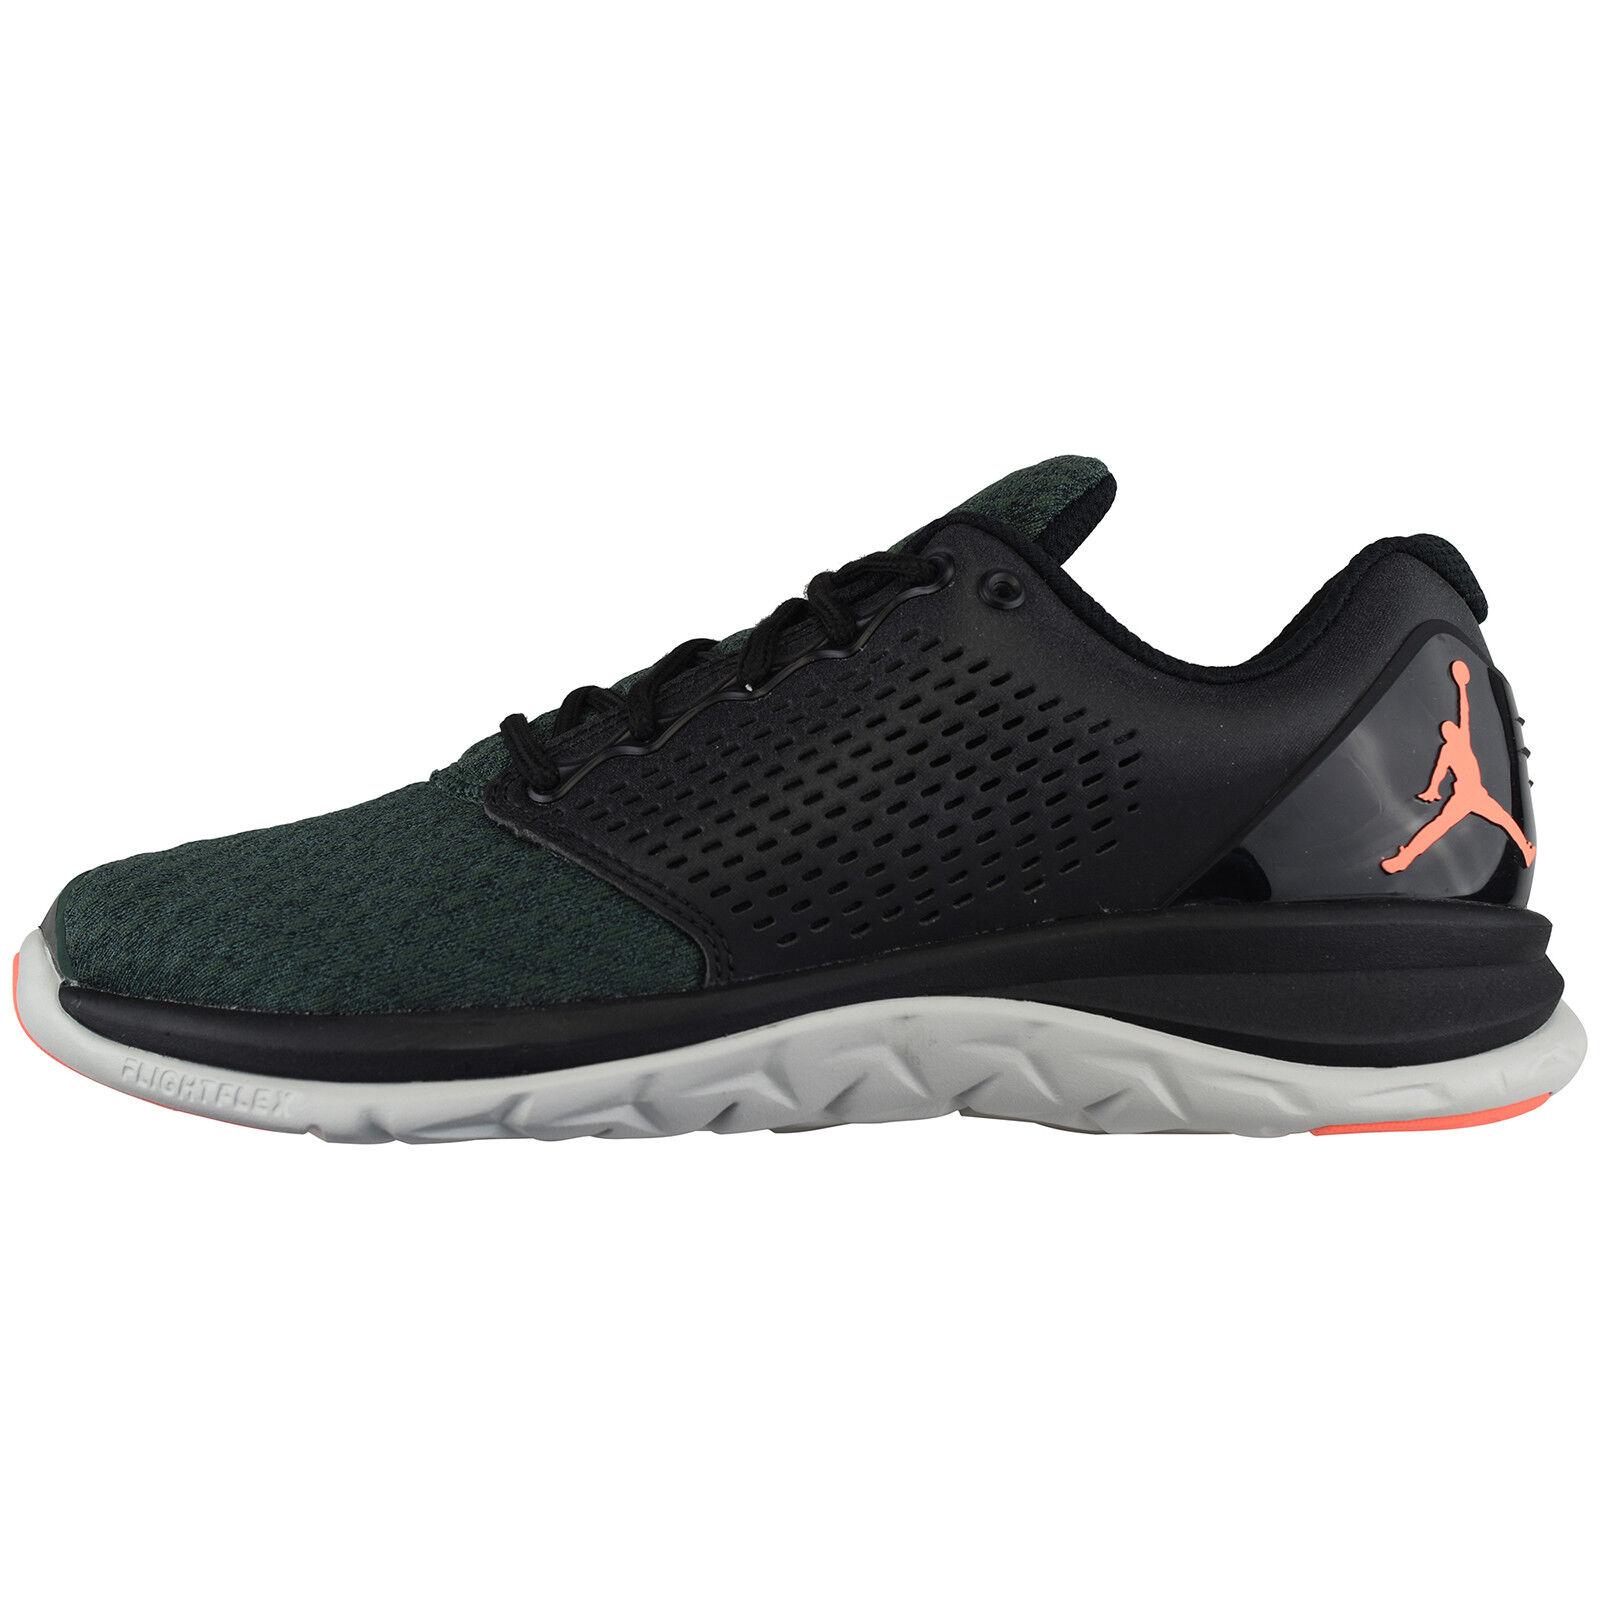 Nike Air Jordan Trainer st Winter 854562-012 Basketball Running shoes Trainers